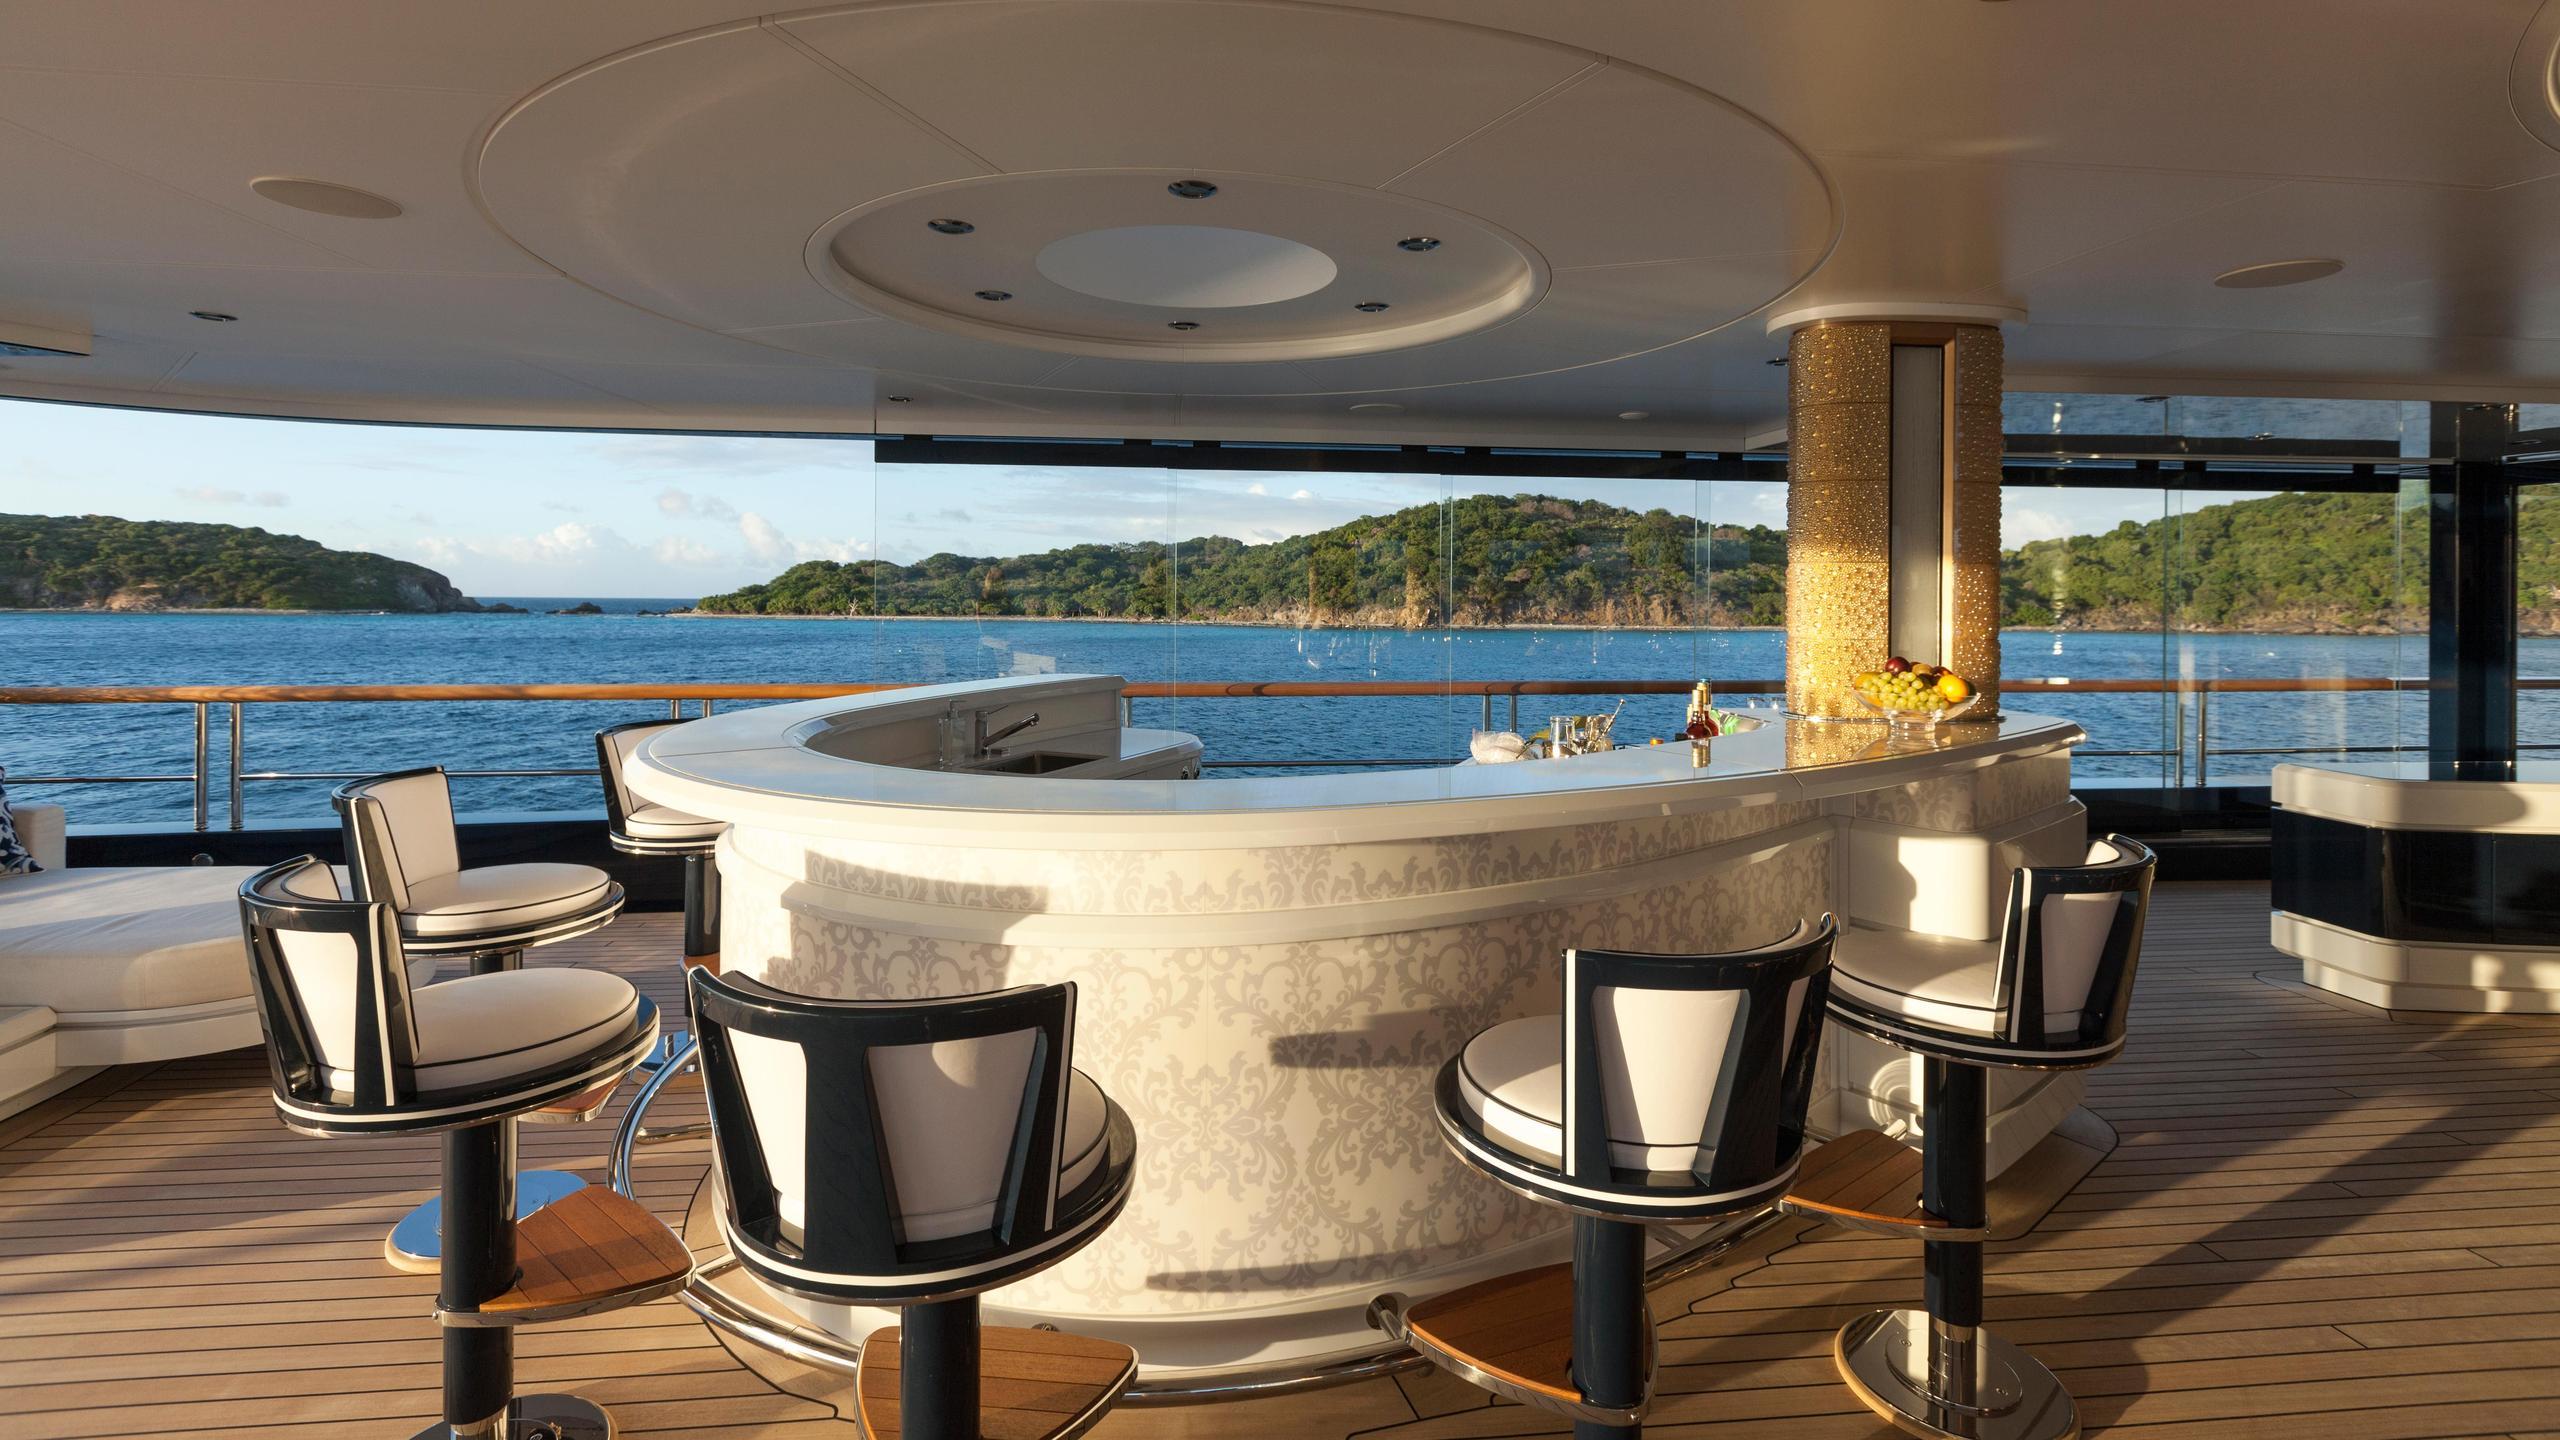 solandge-motor-yacht-lurssen-2013-85m-bar